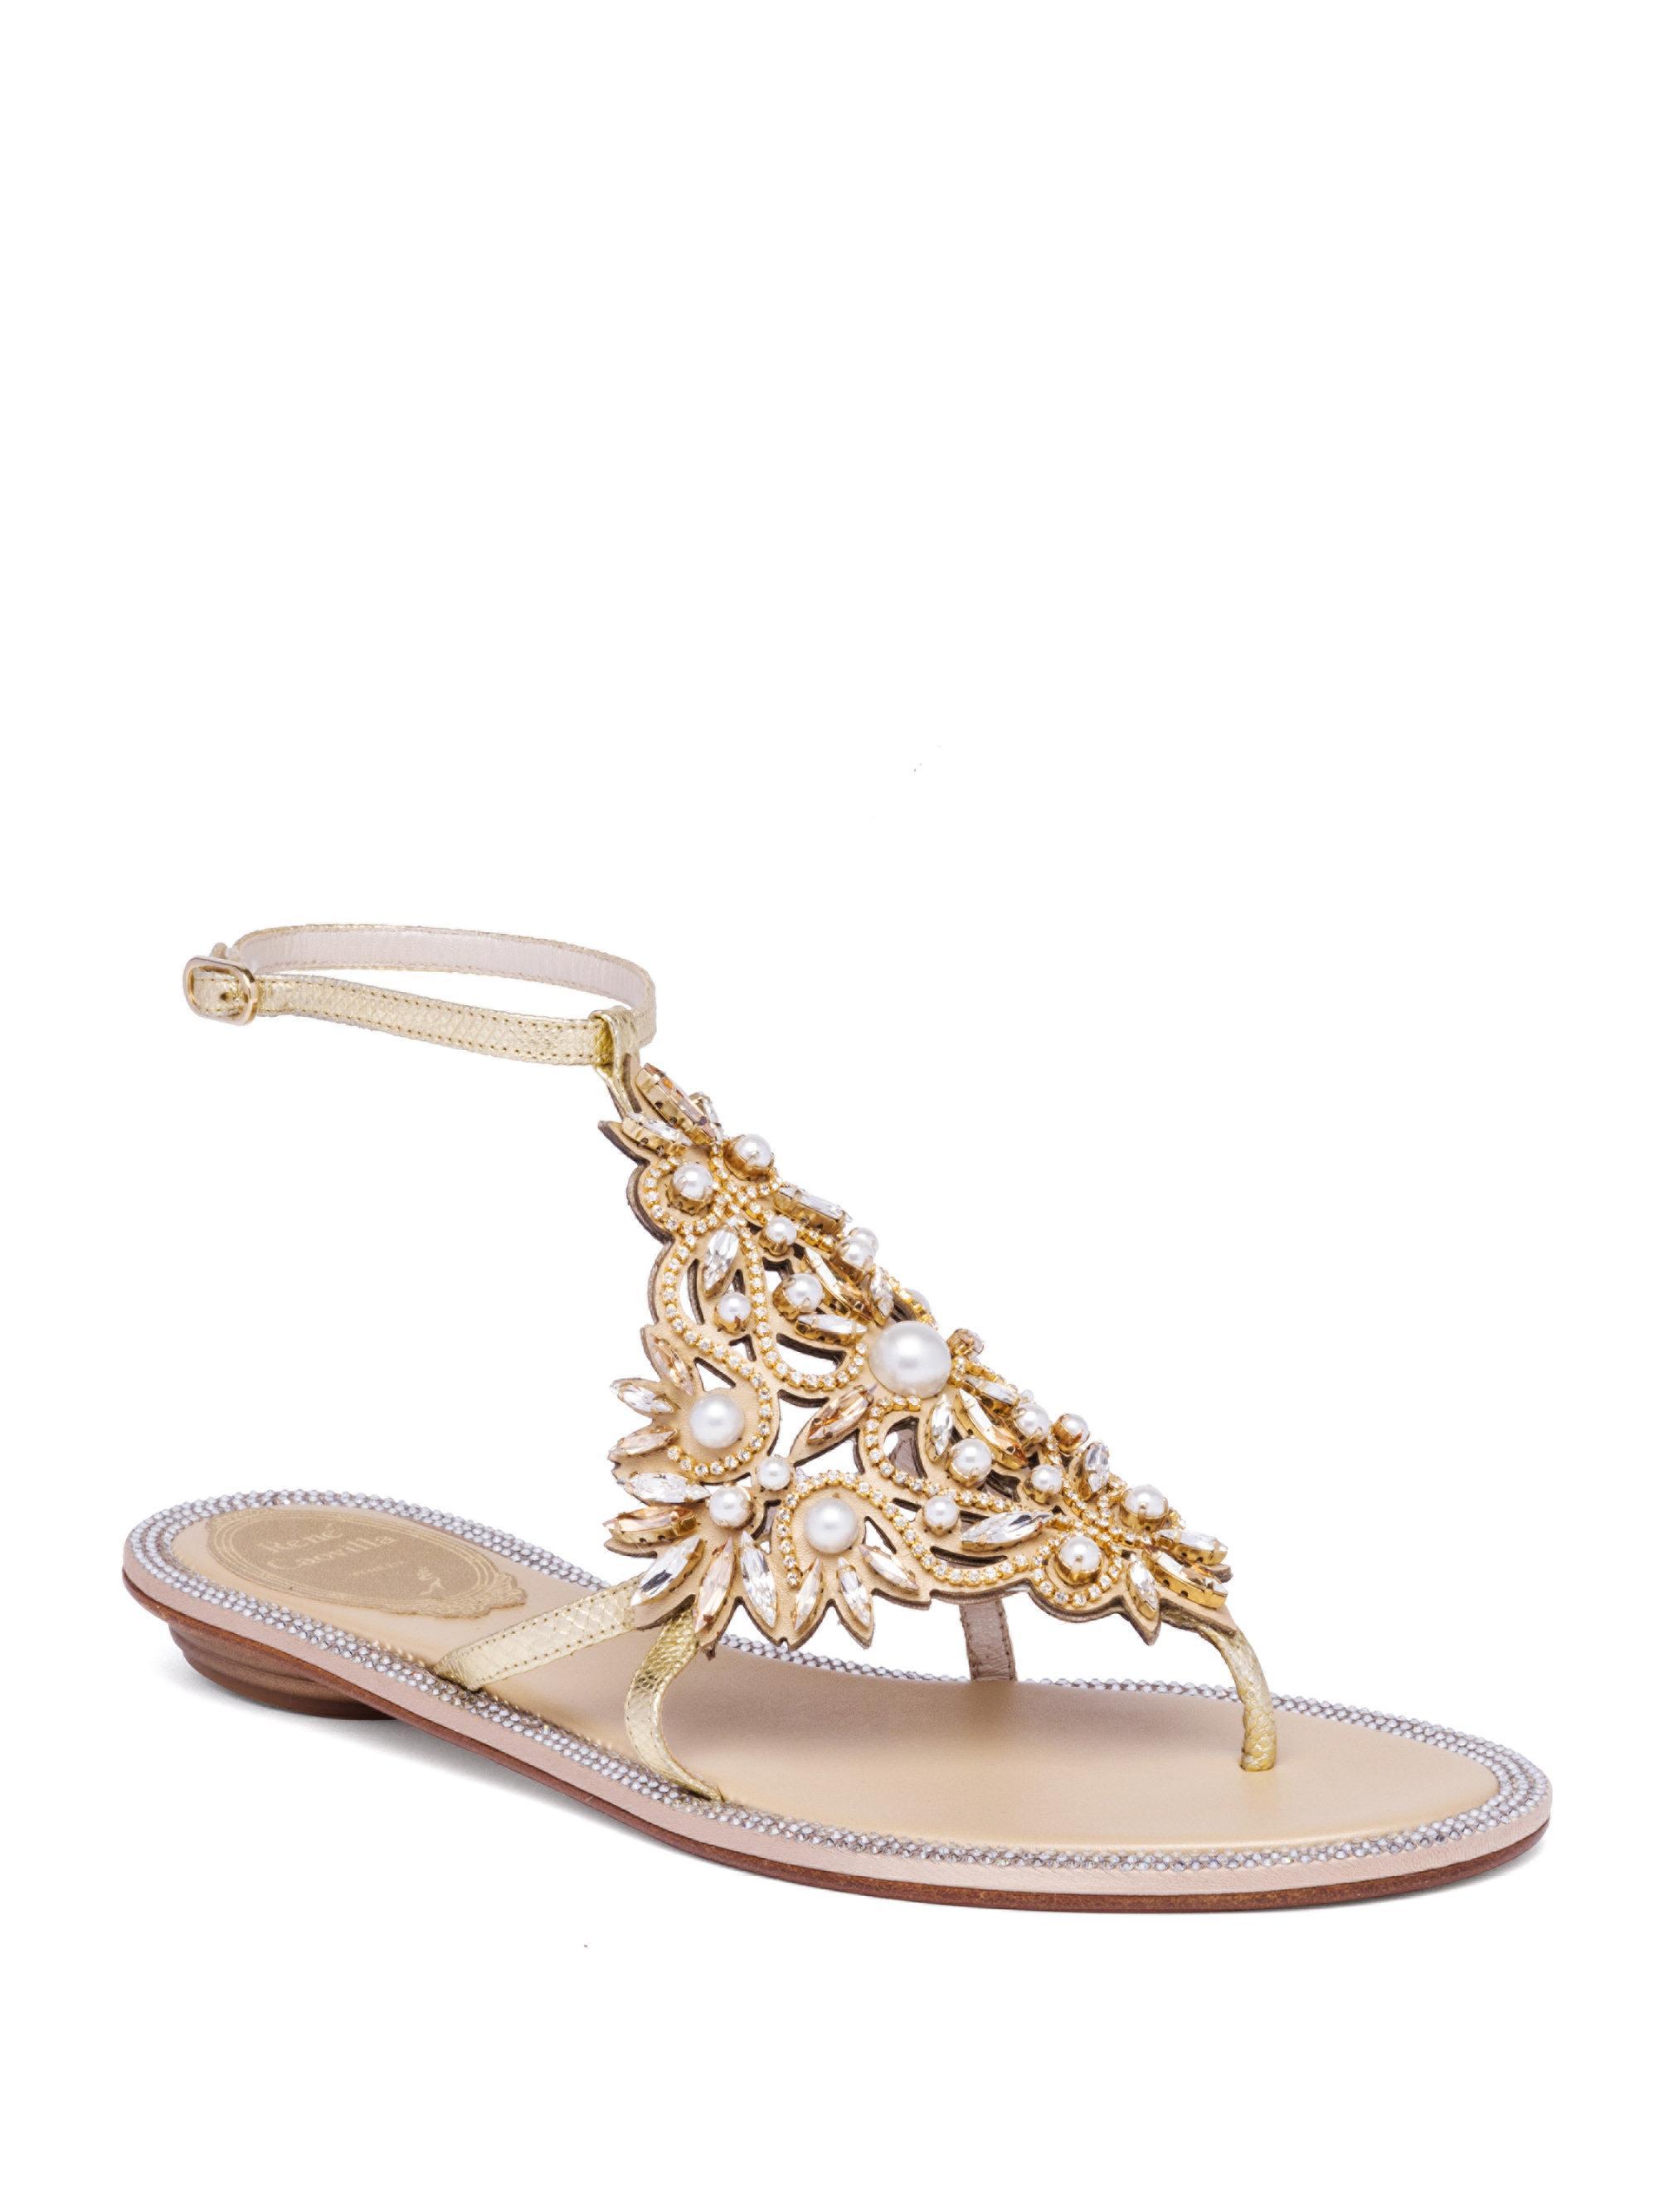 RENé CAOVILLA Embellished Metallic Snakeskin Sandals zJXBODJ